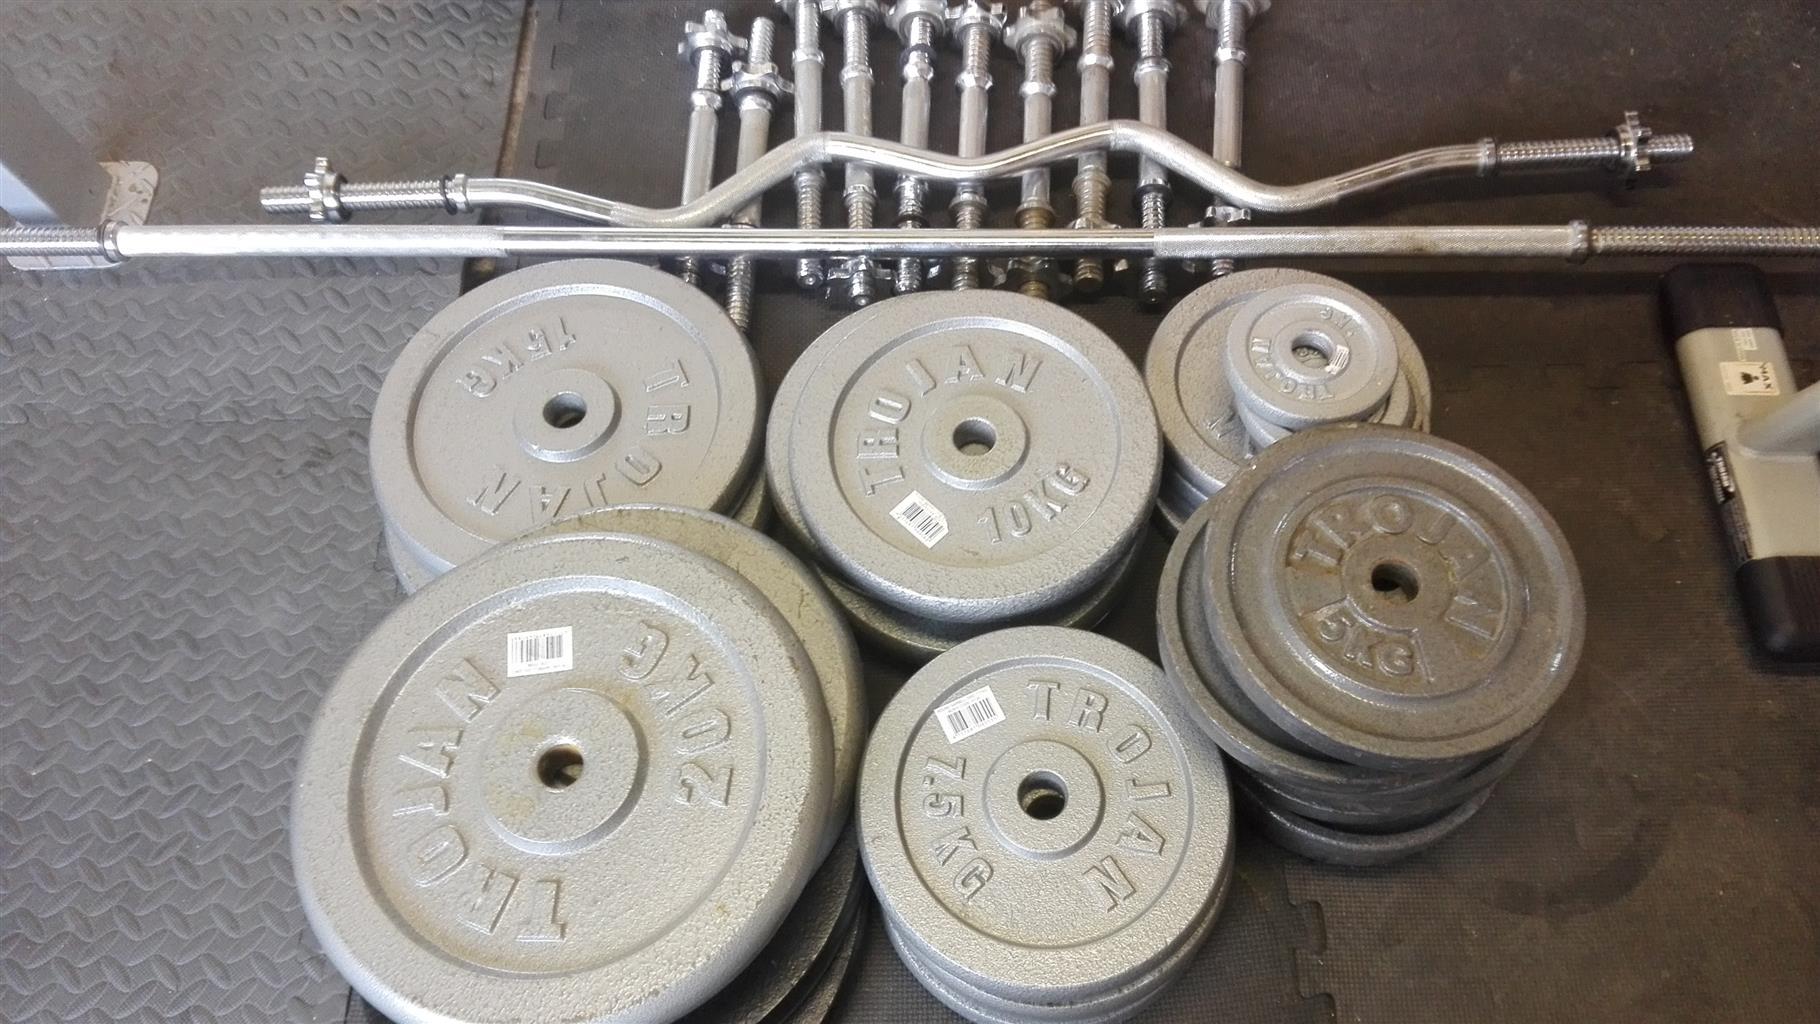 Weights R15 Per kg,Dumbells,Barbell R100 each